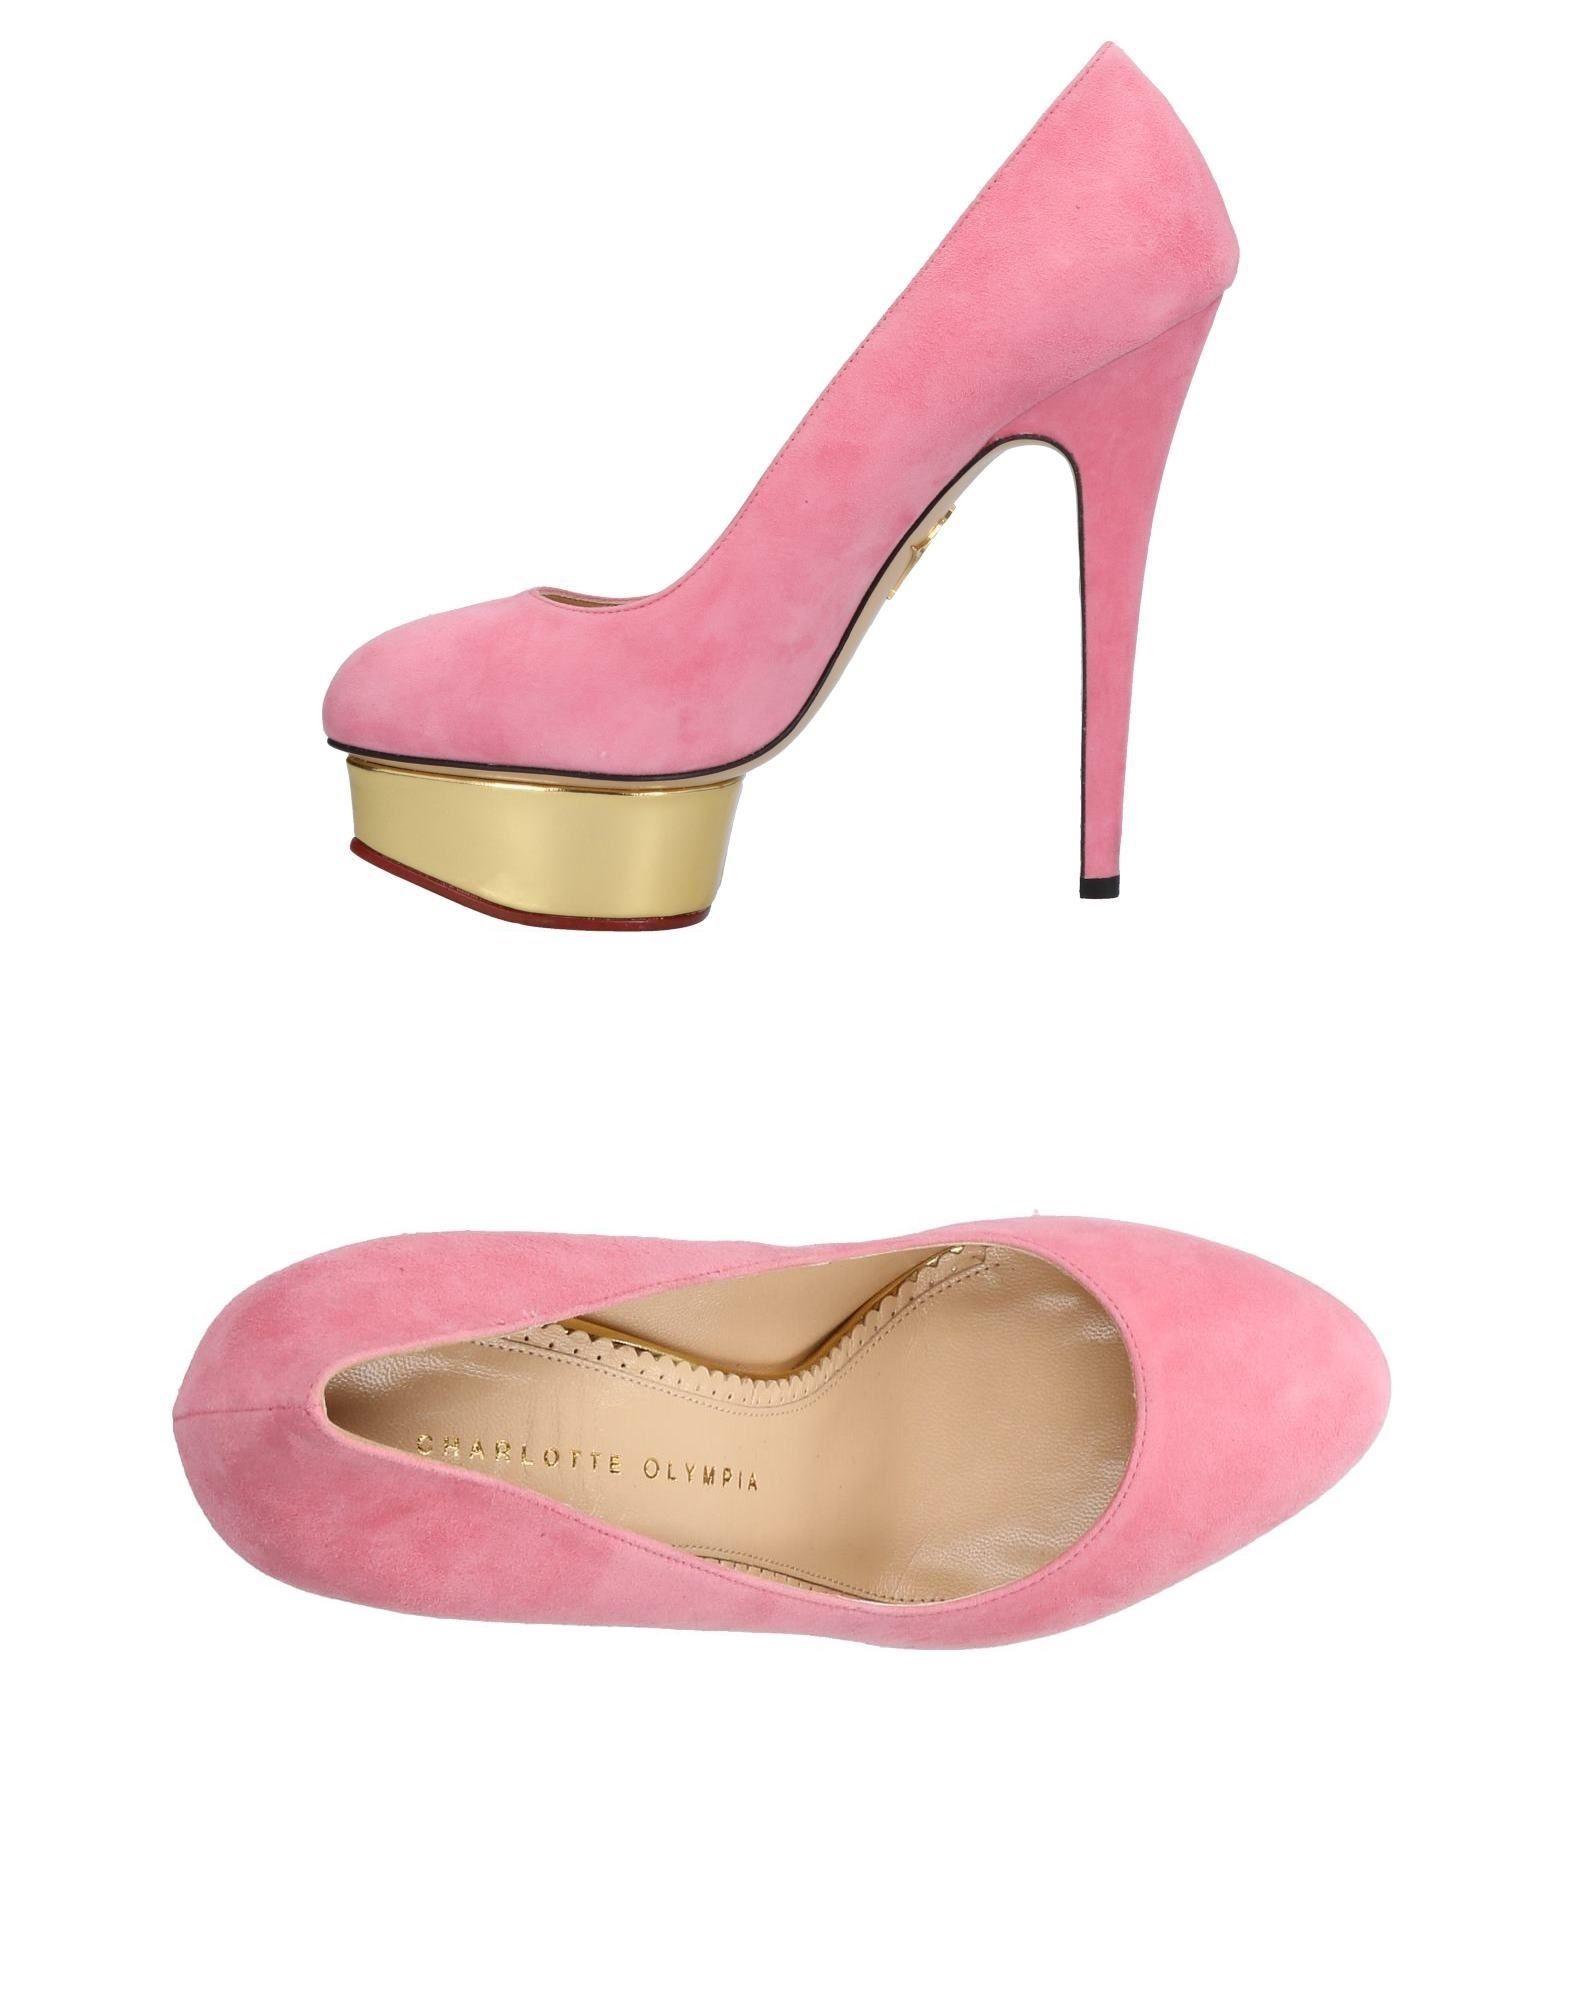 Rabatt Schuhe Charlotte Olympia Pumps Damen  11487021XW